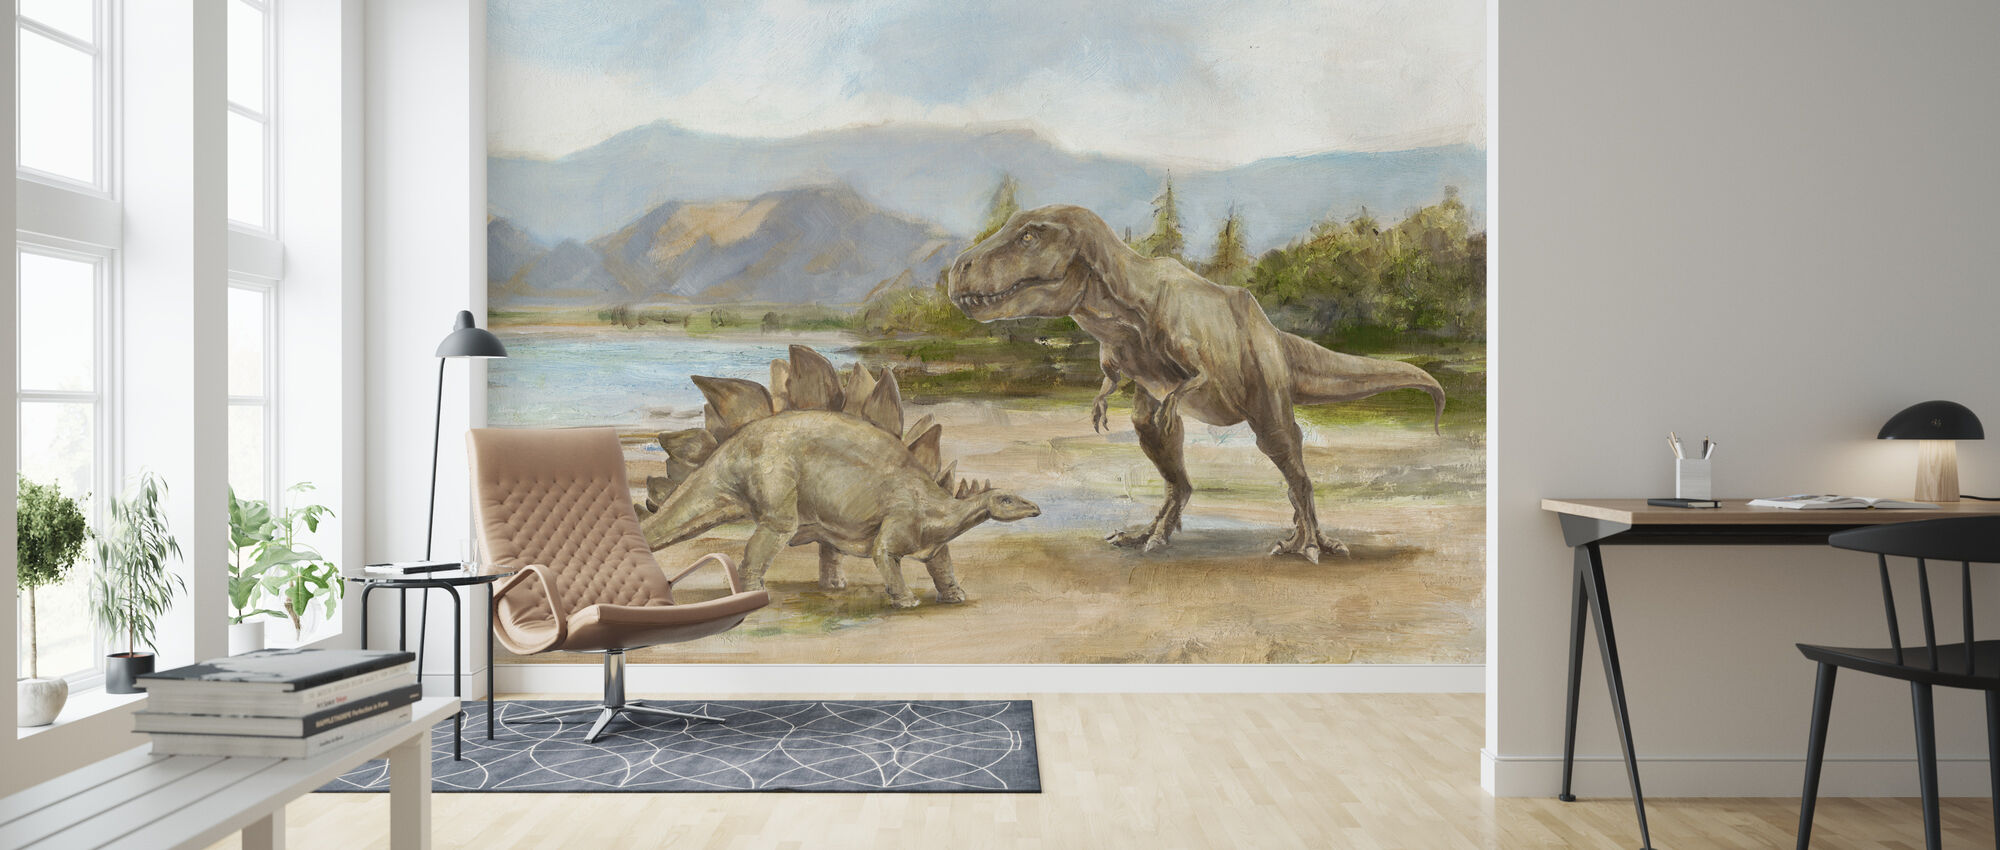 Dinosaurie - Tapet - Vardagsrum